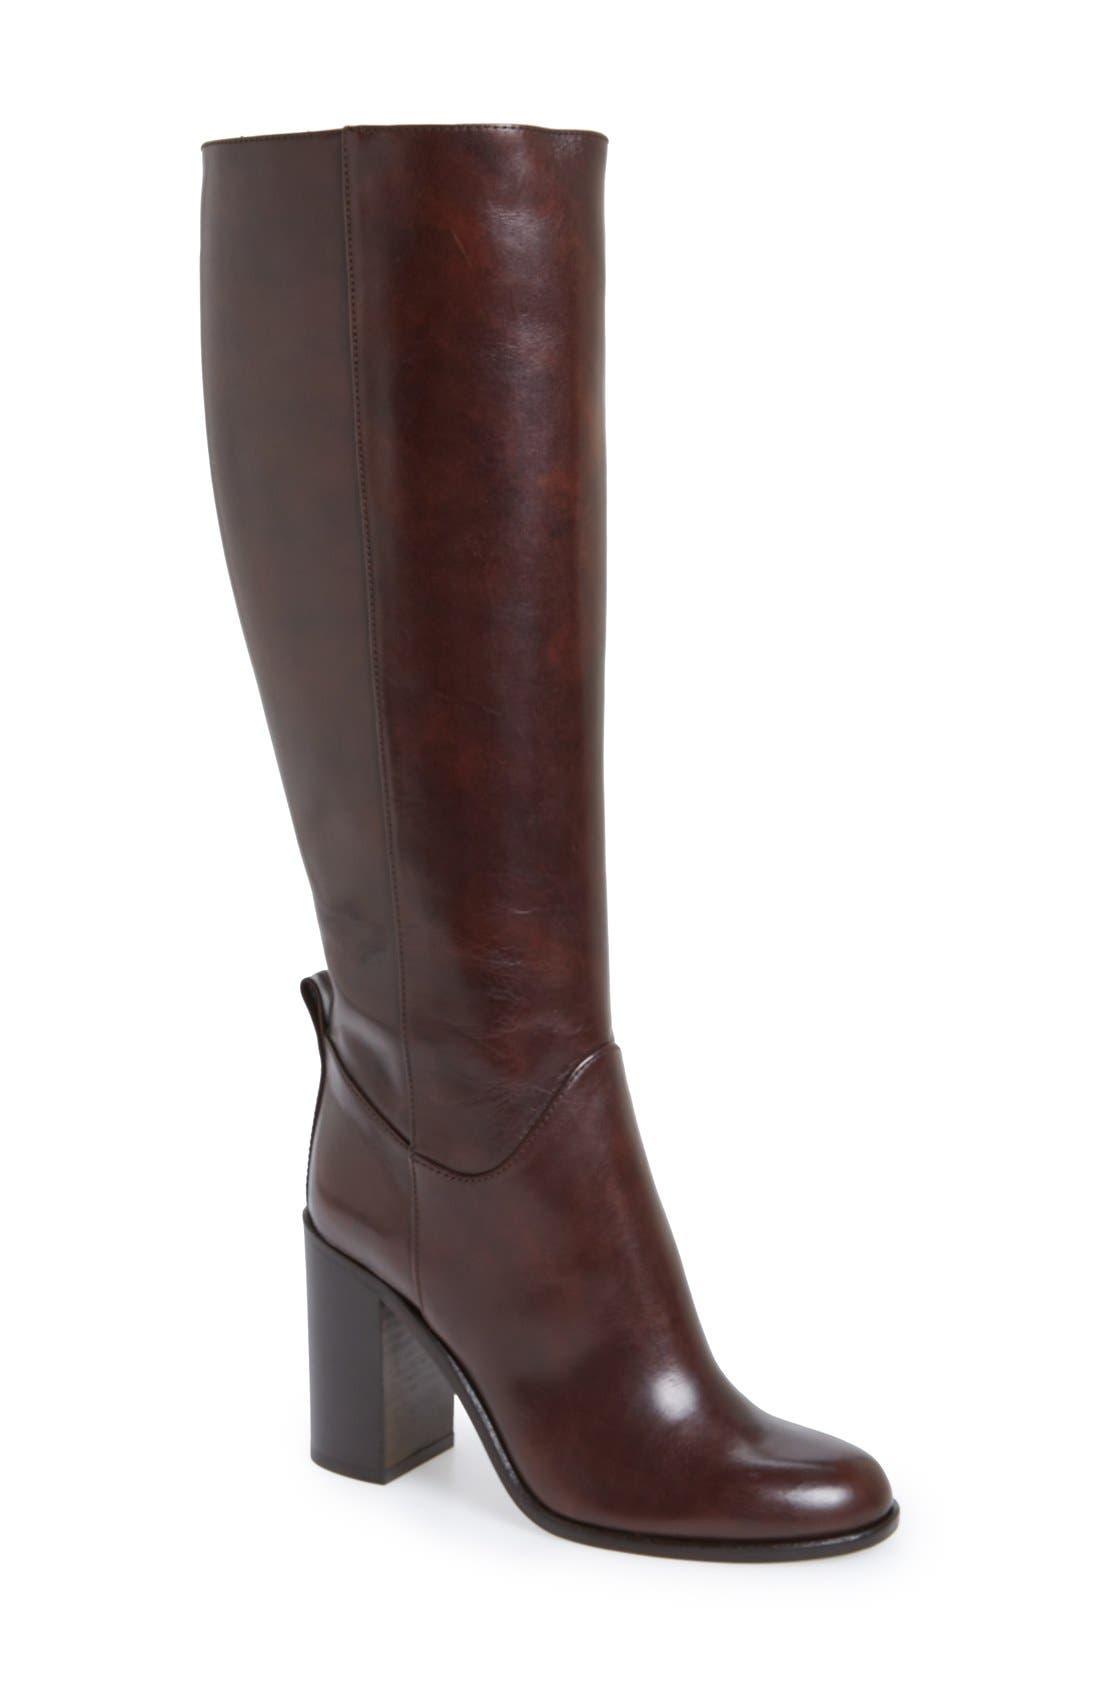 Main Image - kate spade new york 'baina' tall boot (Women)